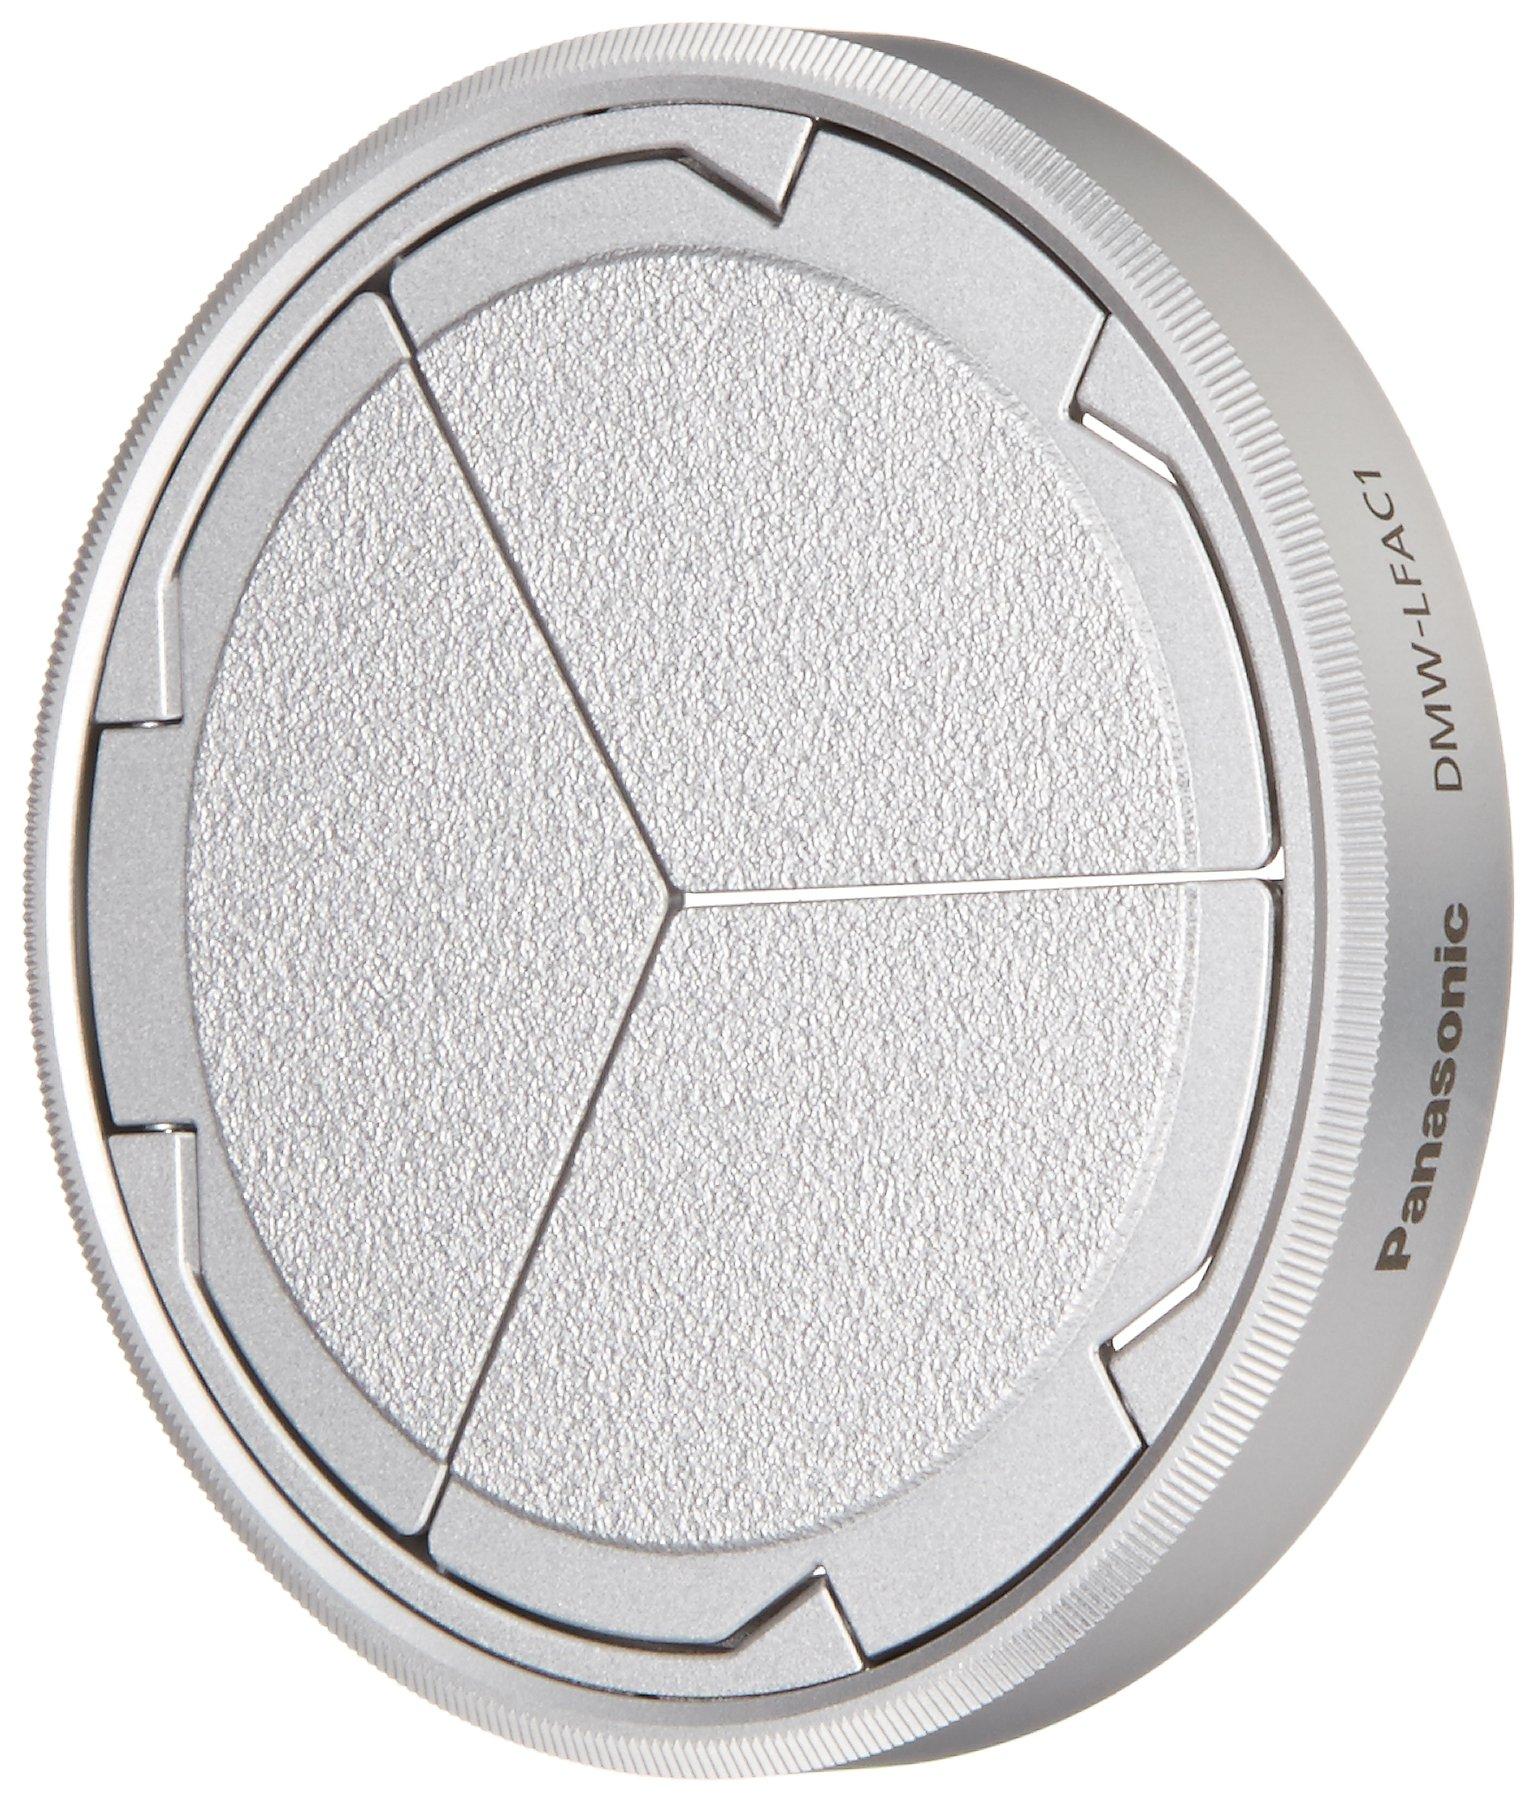 Panasonic DMW-LFAC1S Automatic Lens Cap for Lumix DMC-LX100, Silver by Panasonic